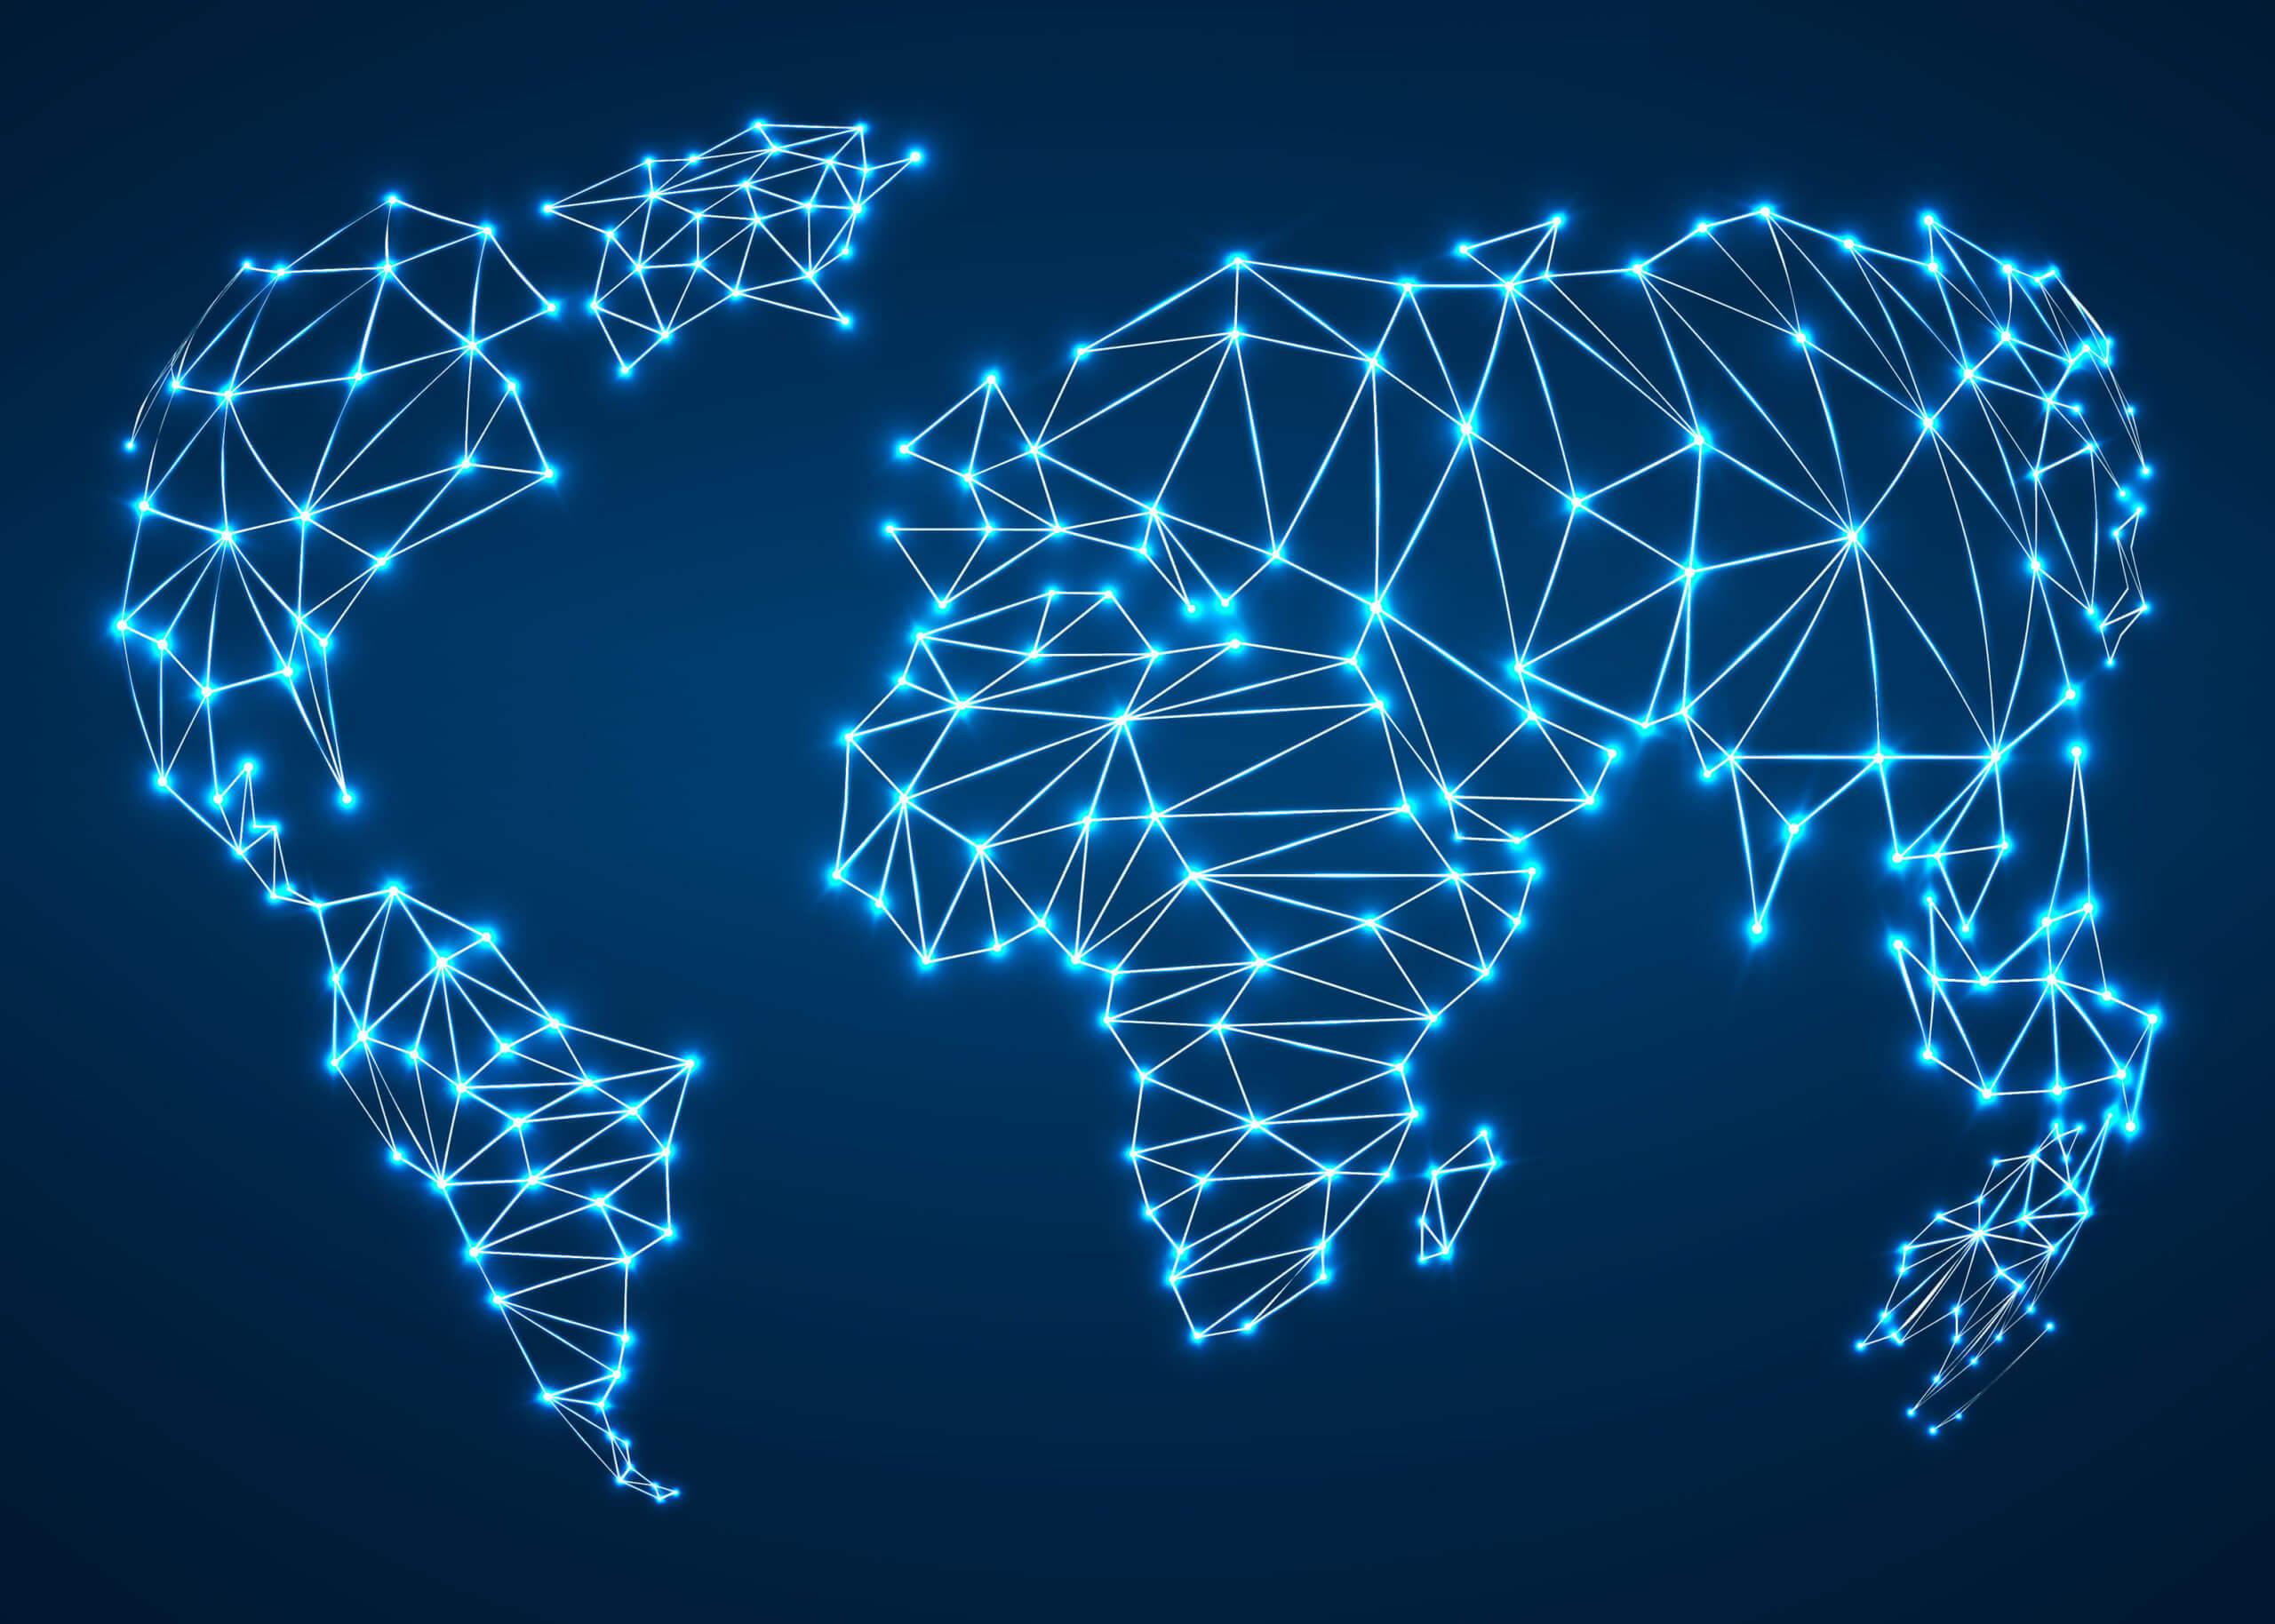 mySupply are part of SAP Ariba Network